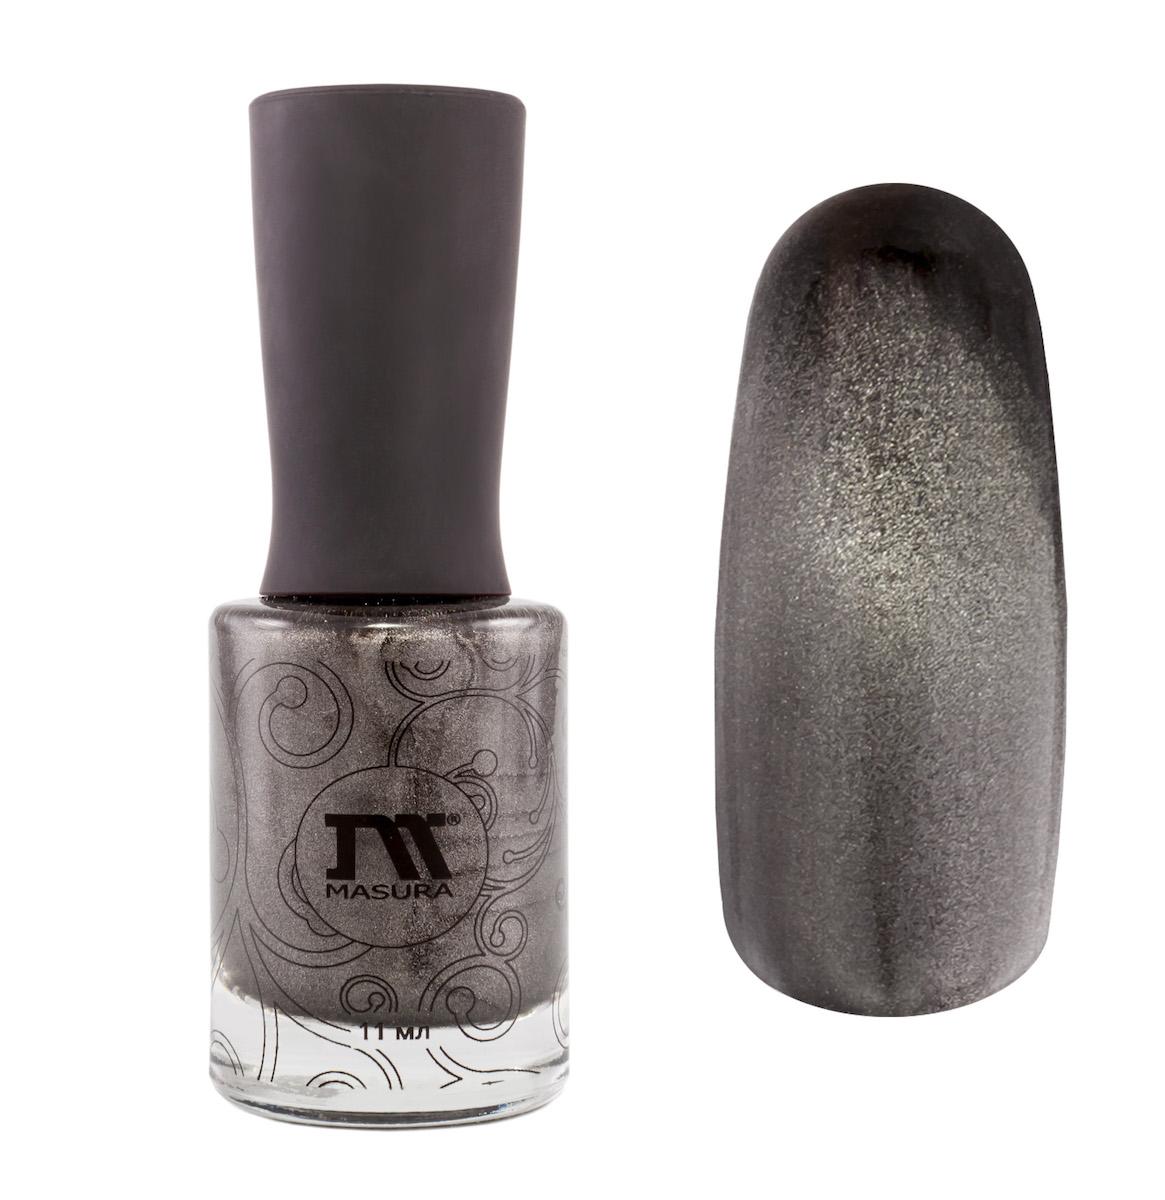 Masura Лак для ногтей Неограненный Алмаз, 11 мл7210581029дымчатый